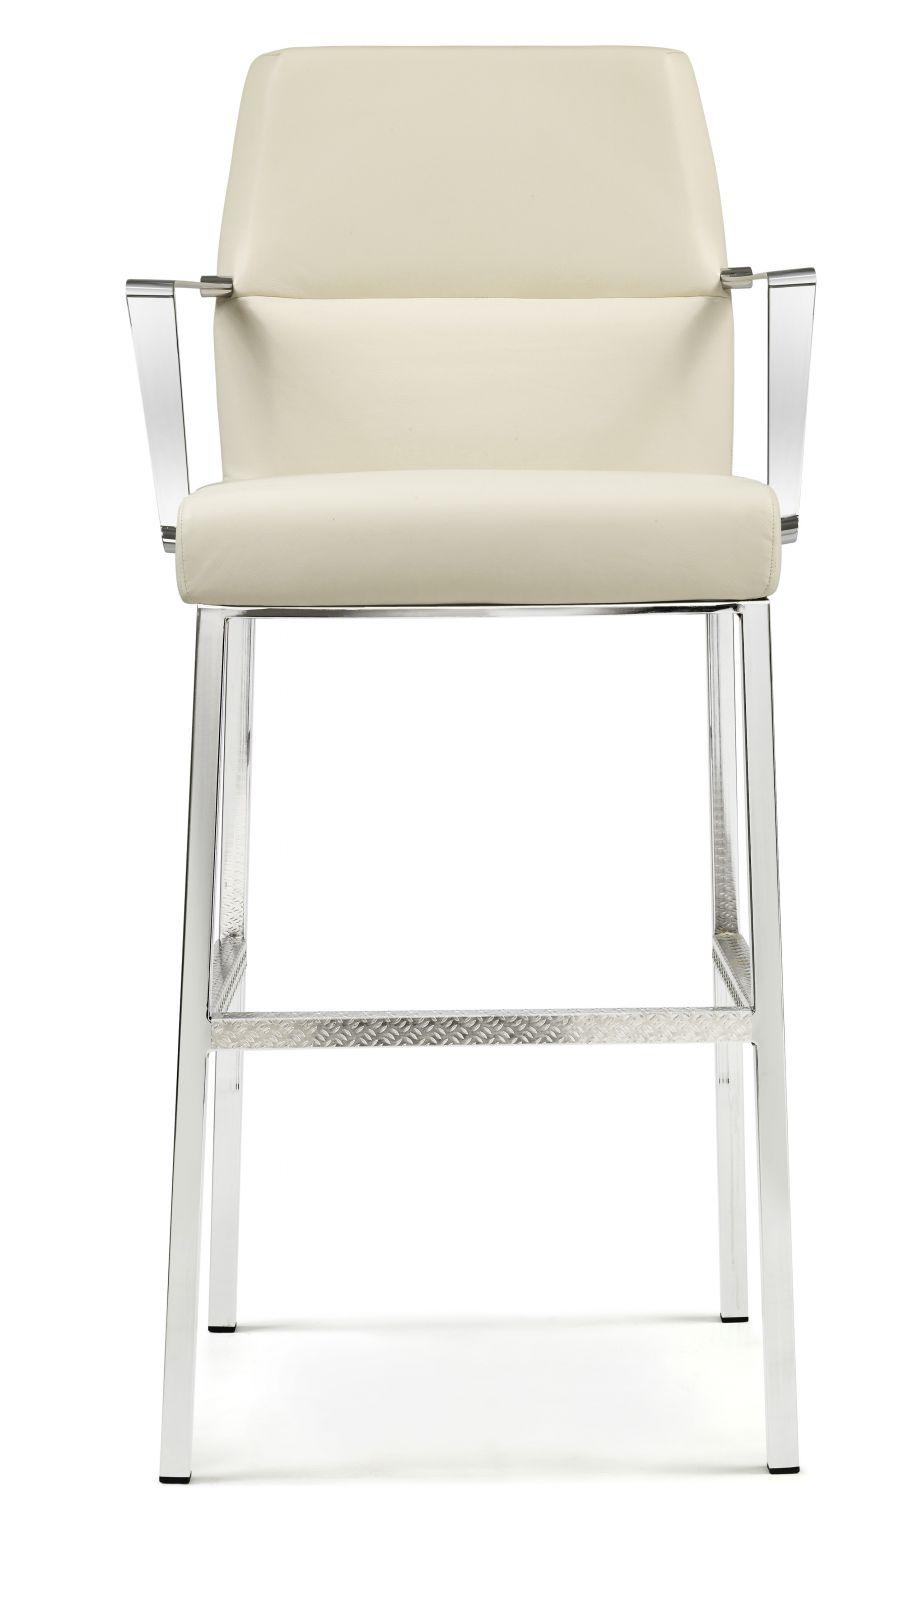 modern-bar-stools-Italian-furniture-large (28).jpg